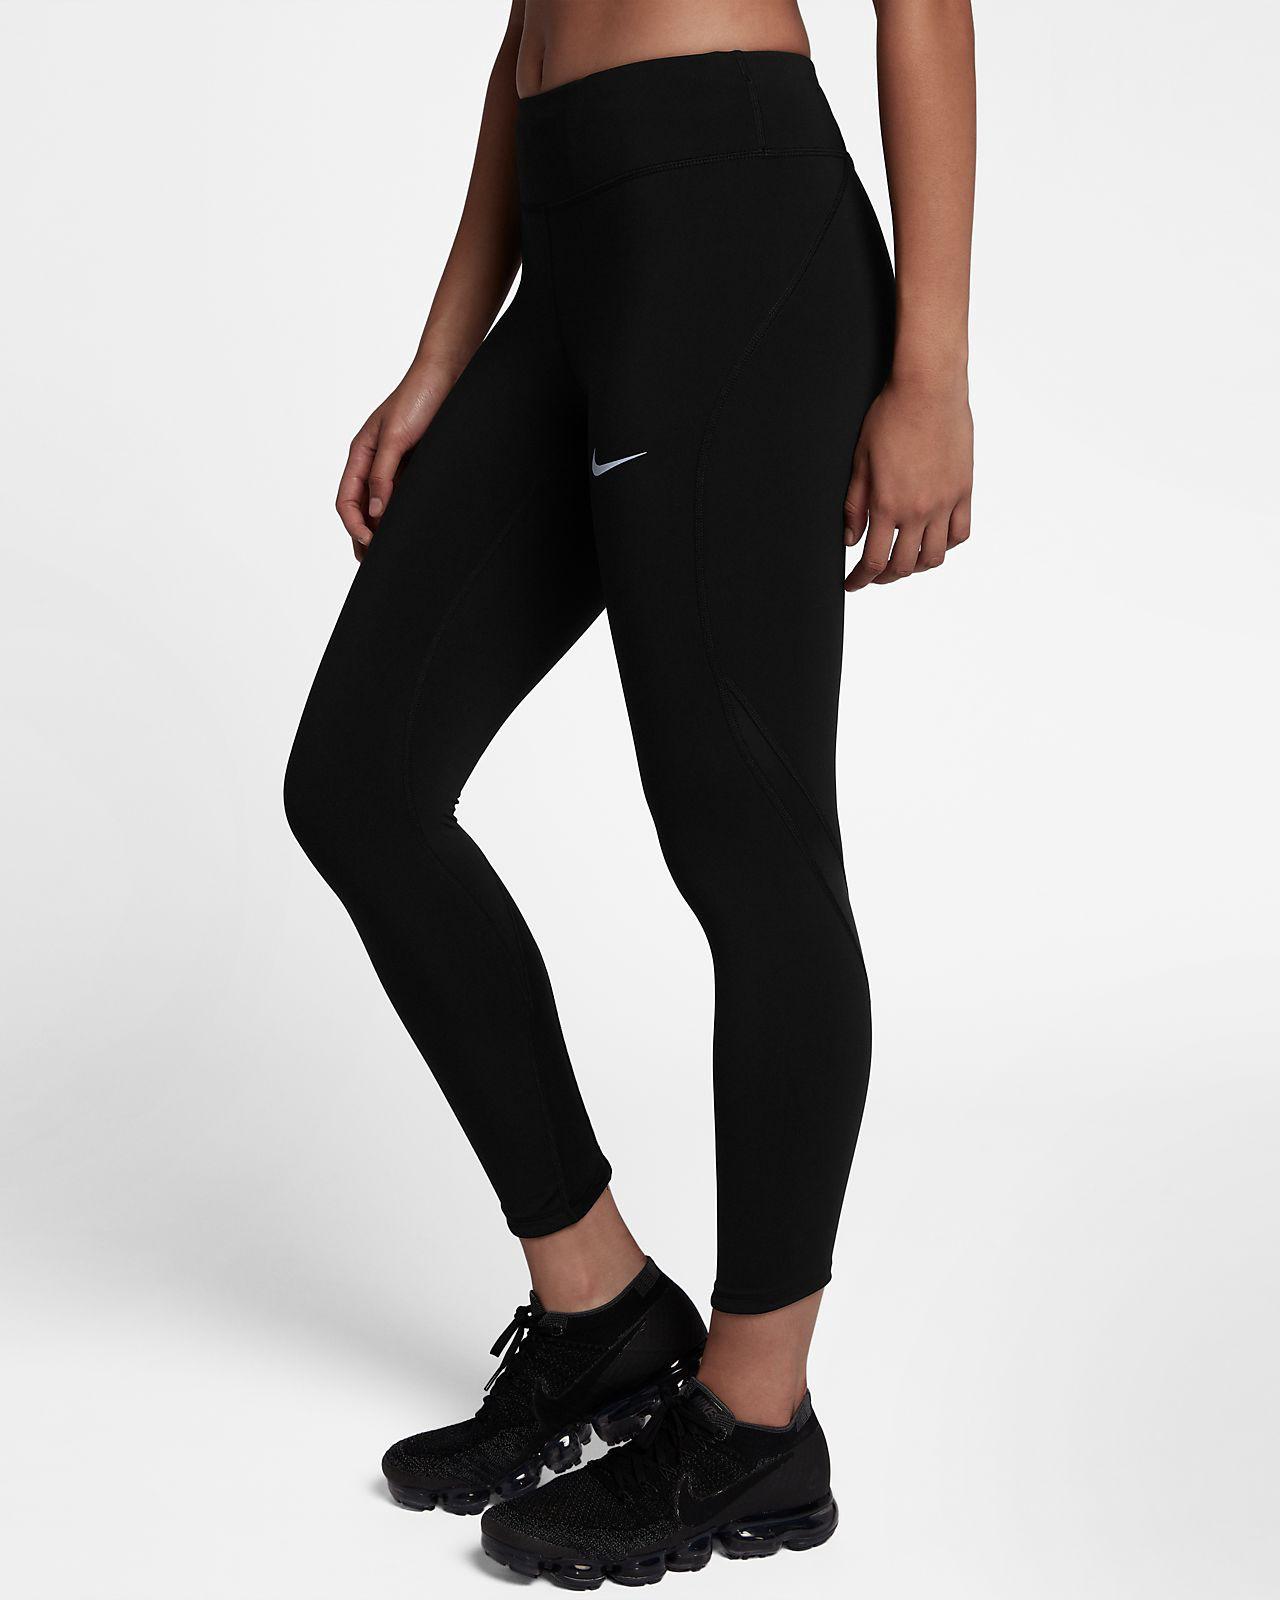 d71daf5f196 Nike Epic Lux Women s 21.5